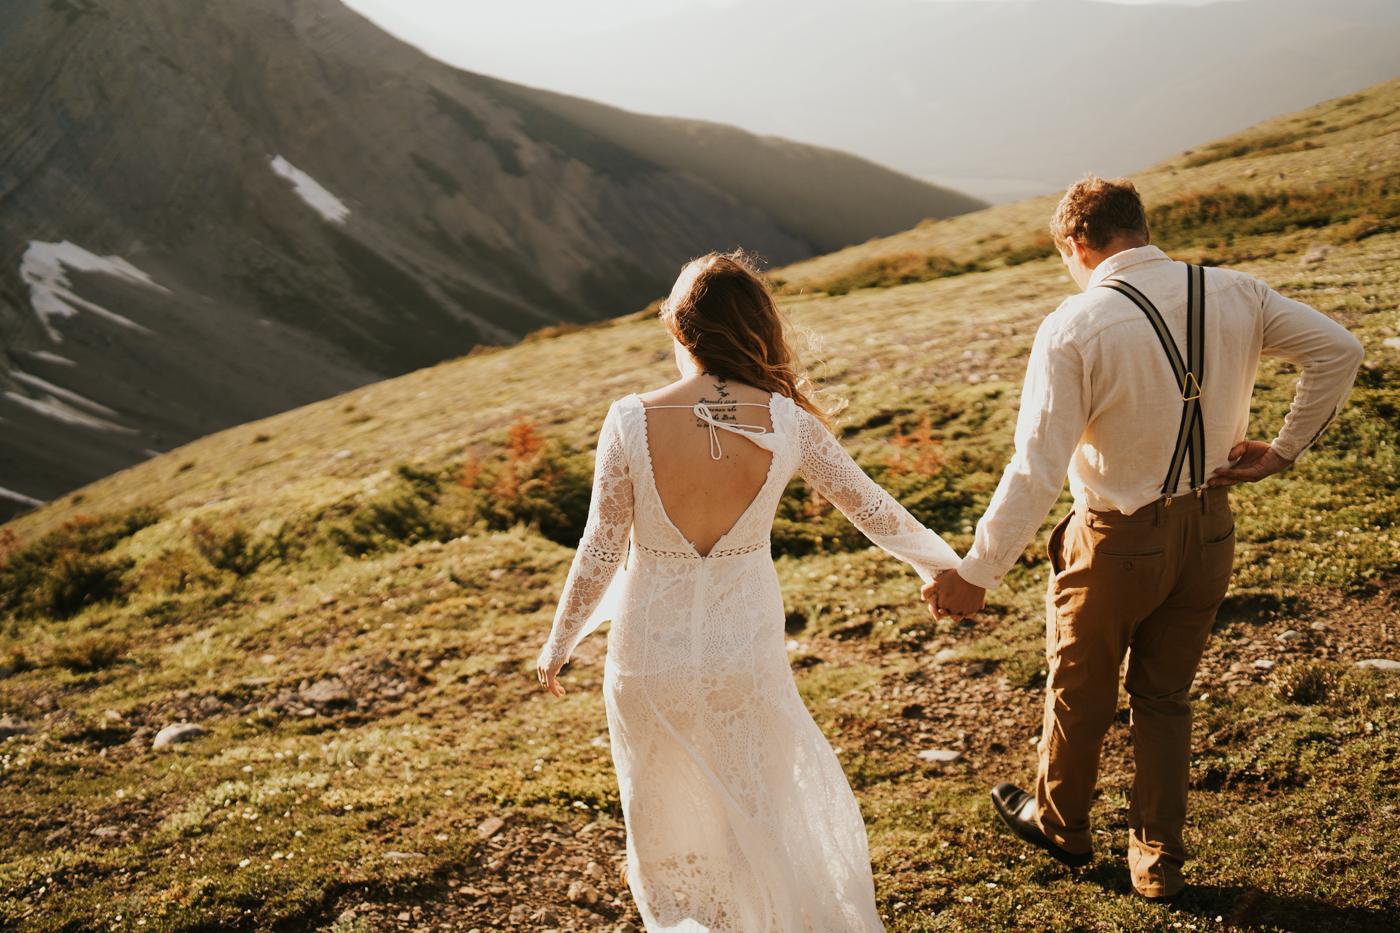 tyraephotography_photographer_wedding_elopement_engagement_photography-08501.jpg